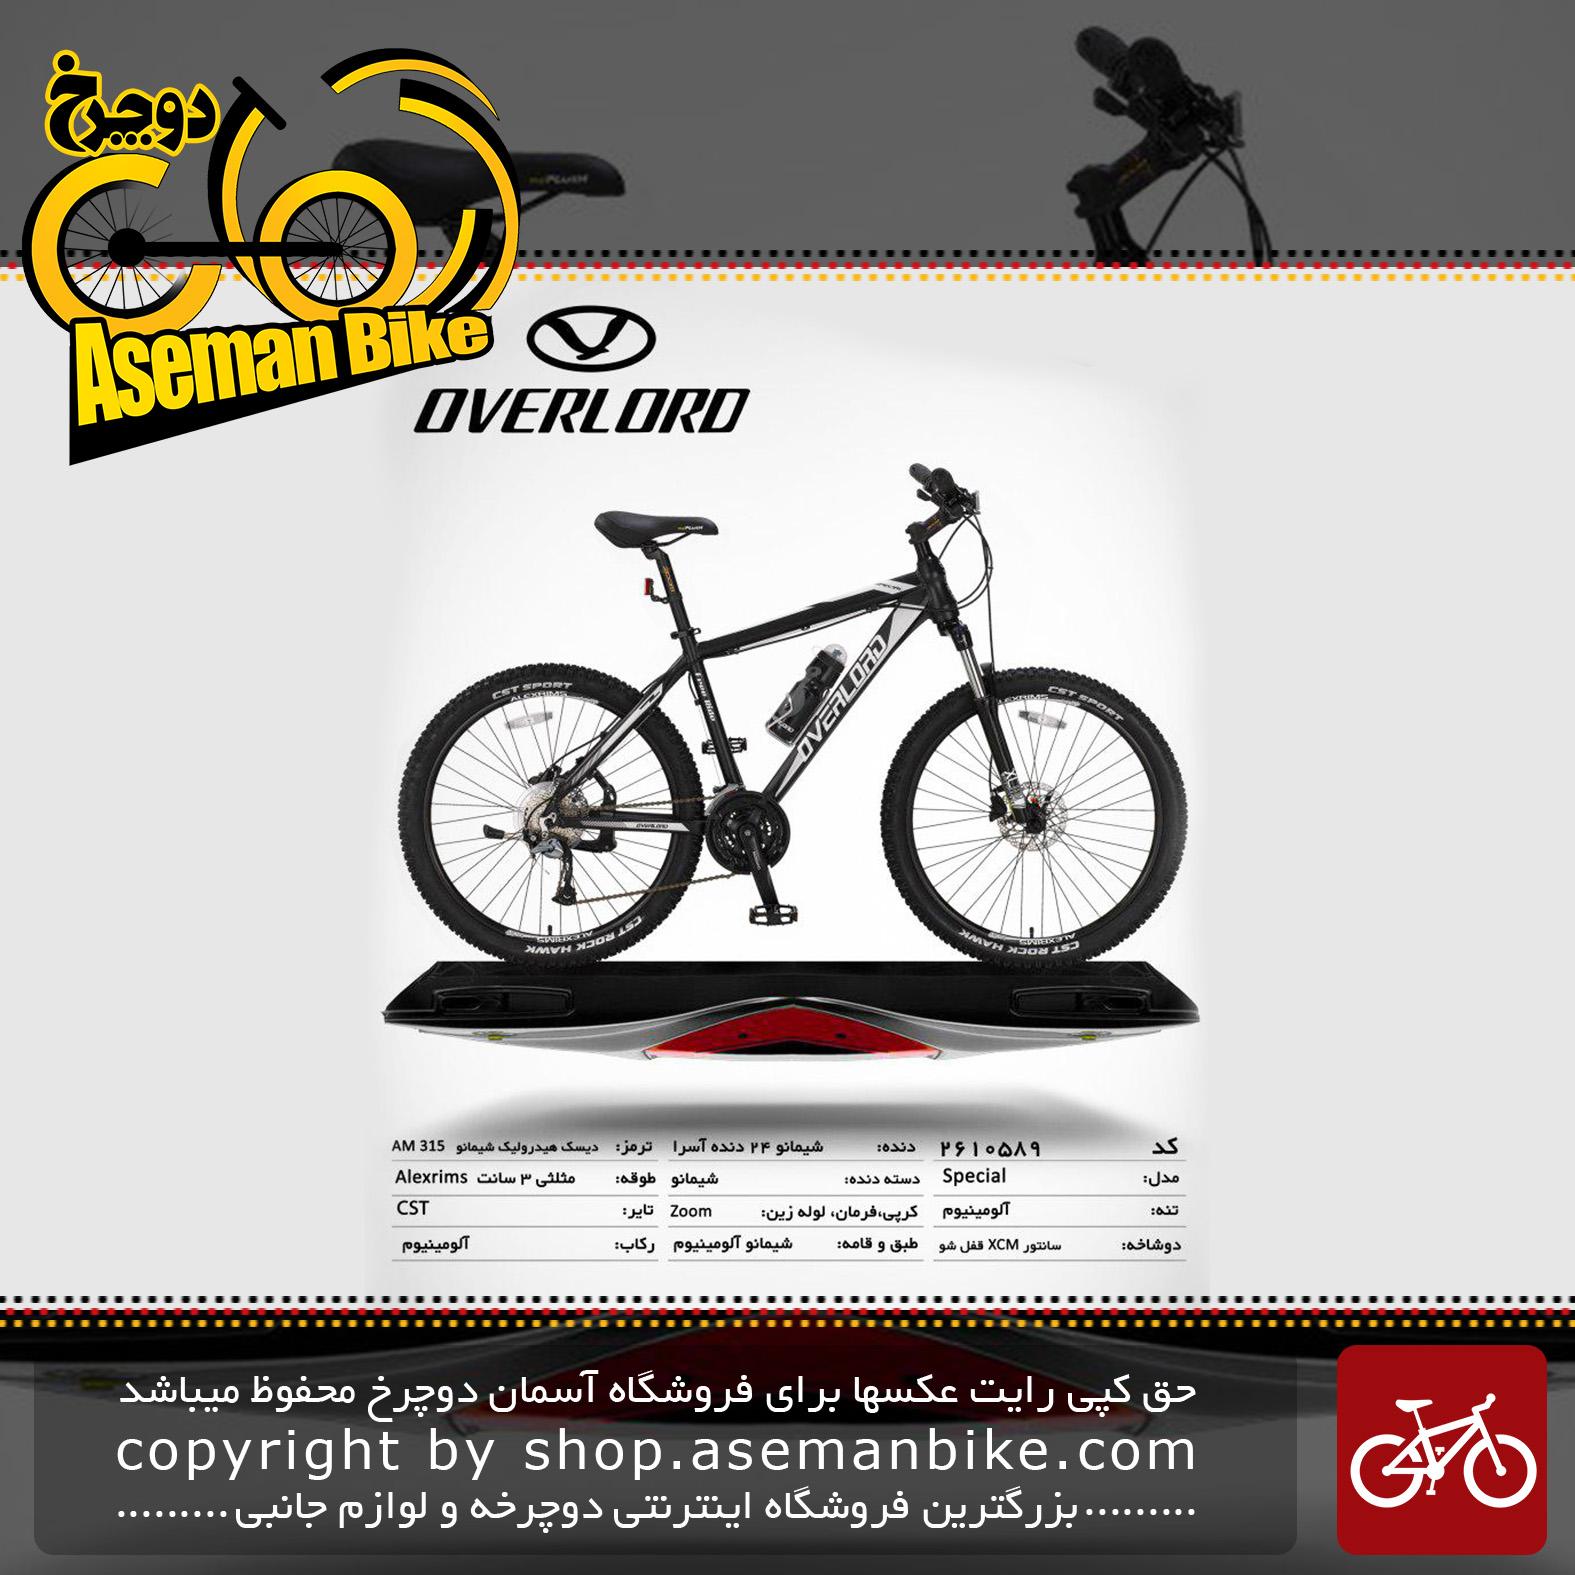 دوچرخه کوهستان شهری اورلرد مدل اسپشال 24 دنده شیمانو آسرا سایز 26 ساخت تایوان OVERLORD Mountain City Taiwan Bicycle SPECIAL 27.5 2019